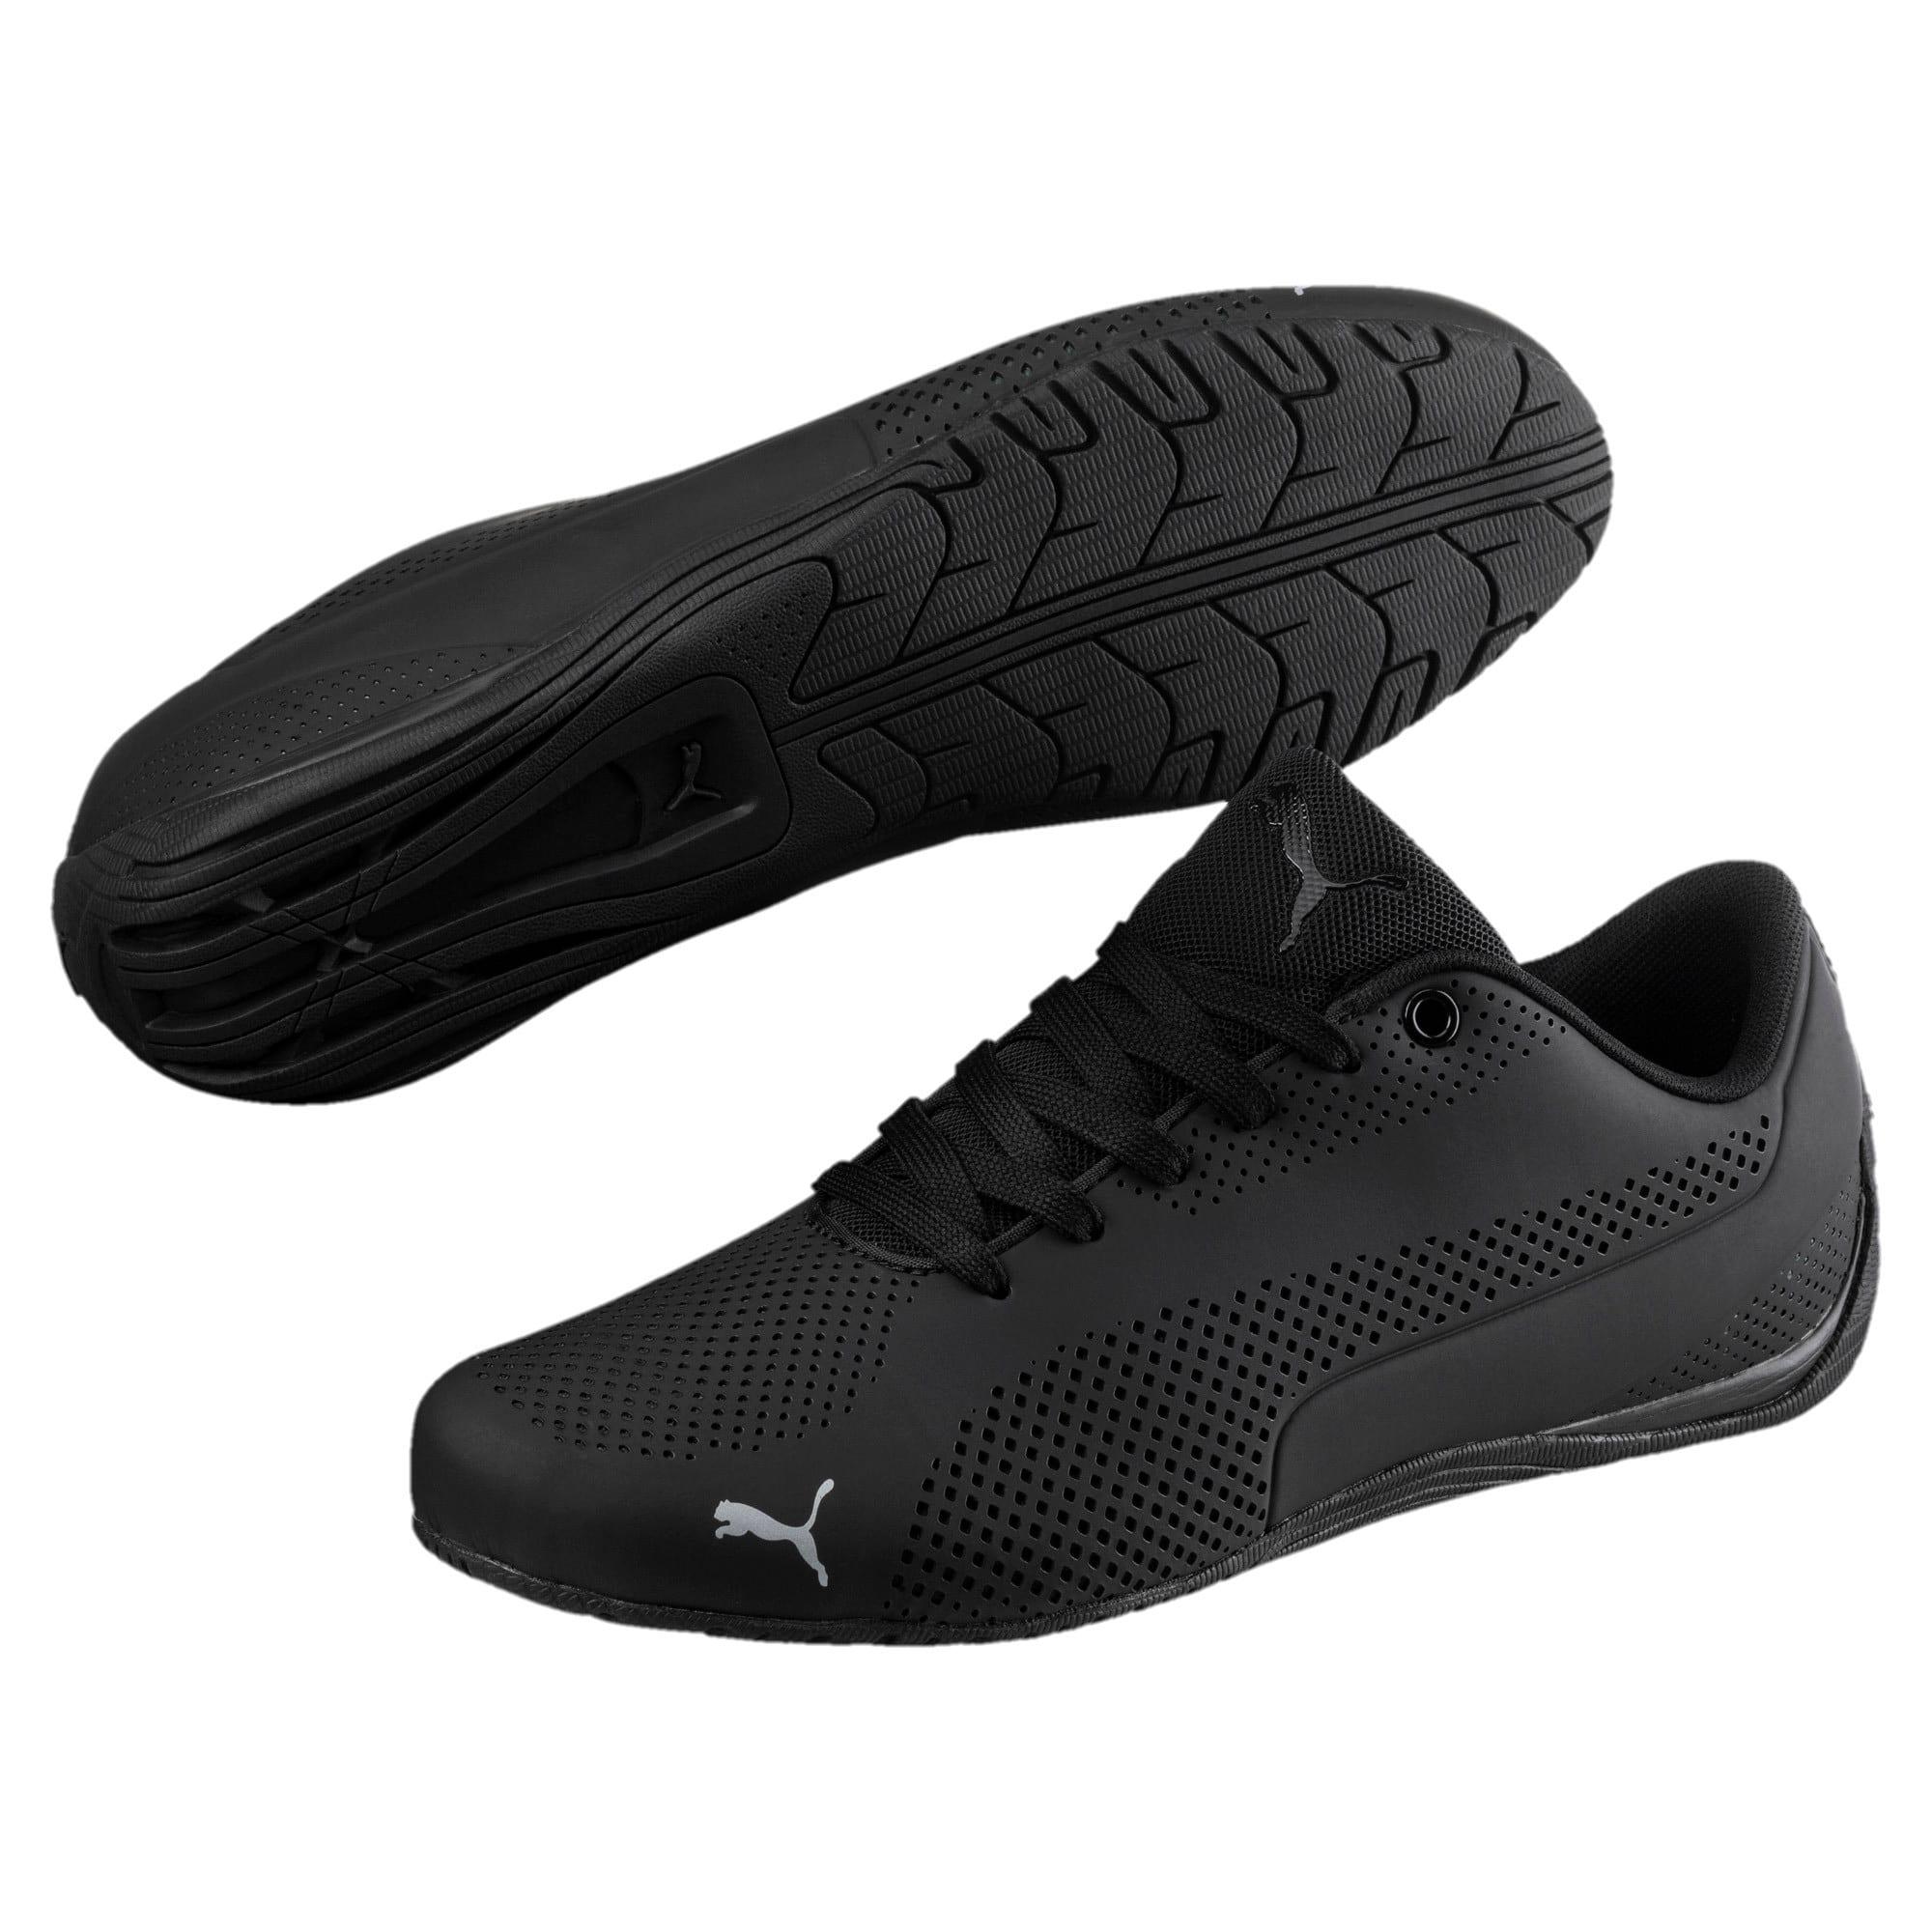 Thumbnail 2 of Drift Cat Ultra Reflective Shoes, Puma Black-Puma Black-Blk, medium